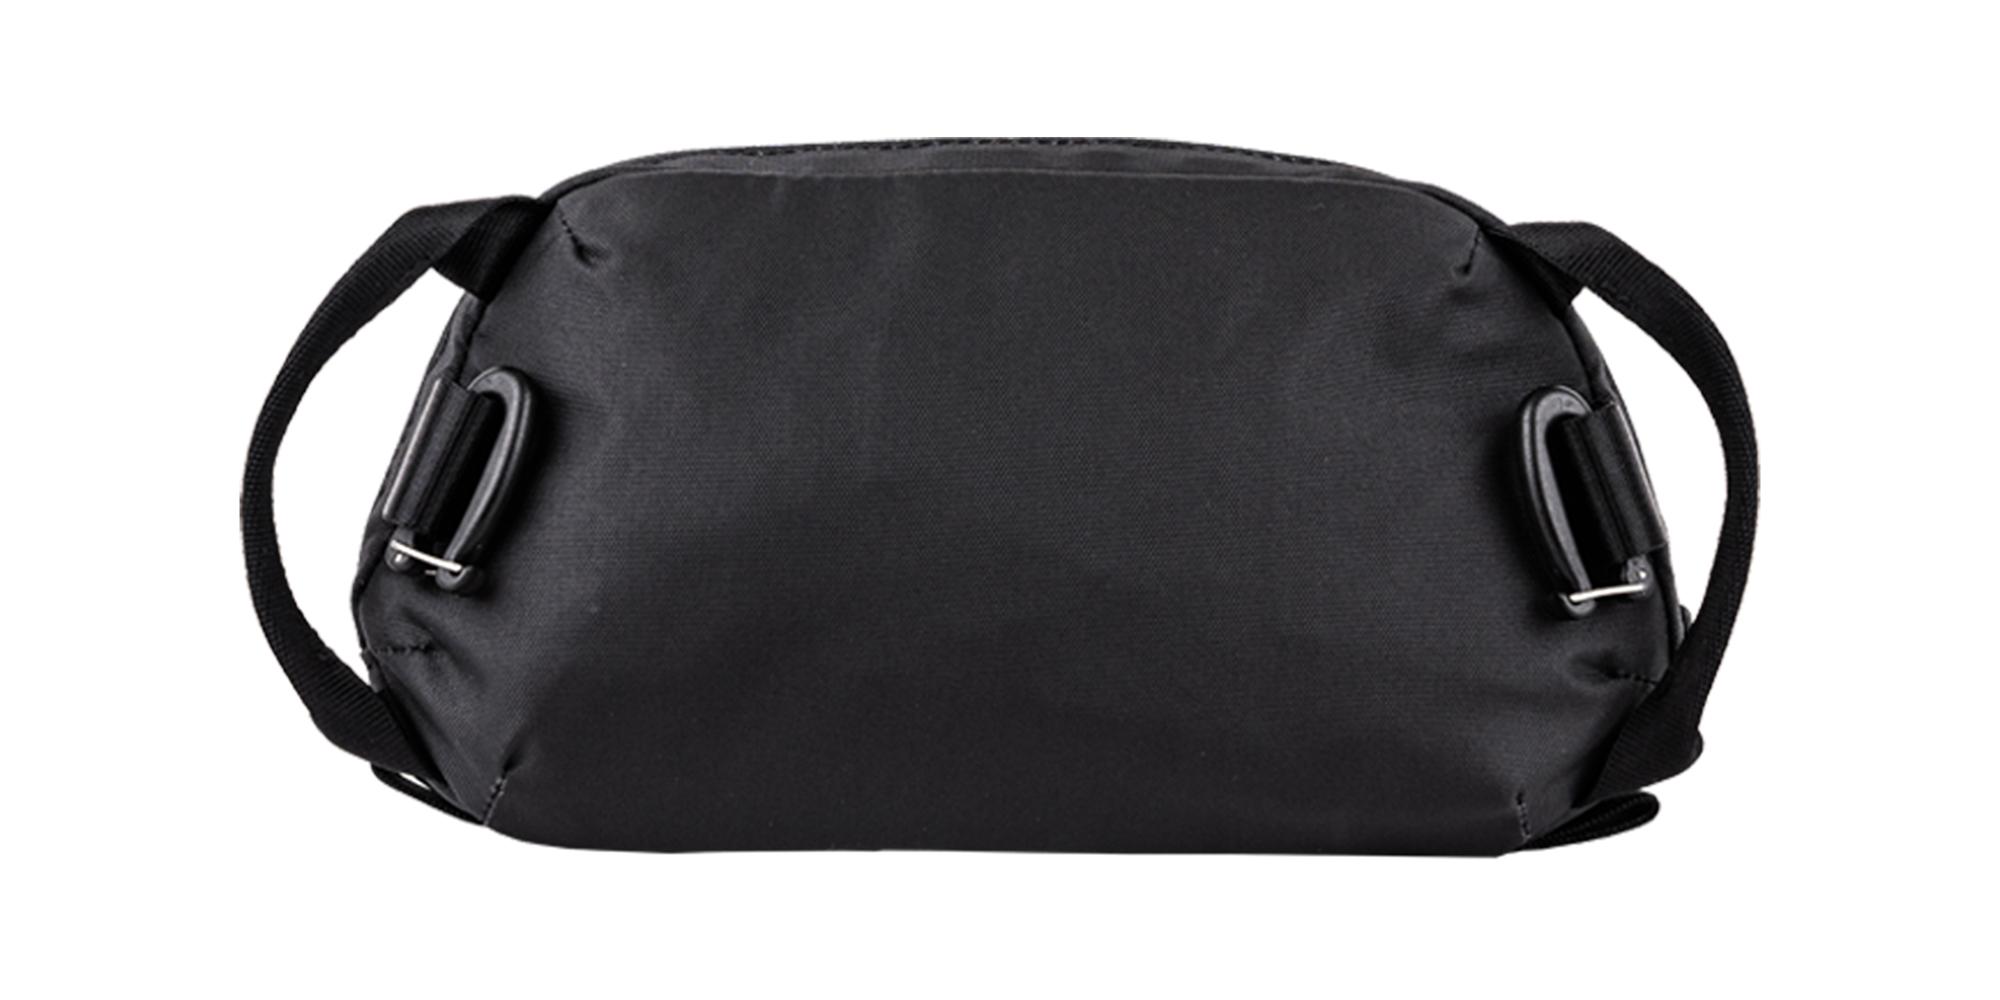 Wandrd Toiletry Bag Medium - back of bag